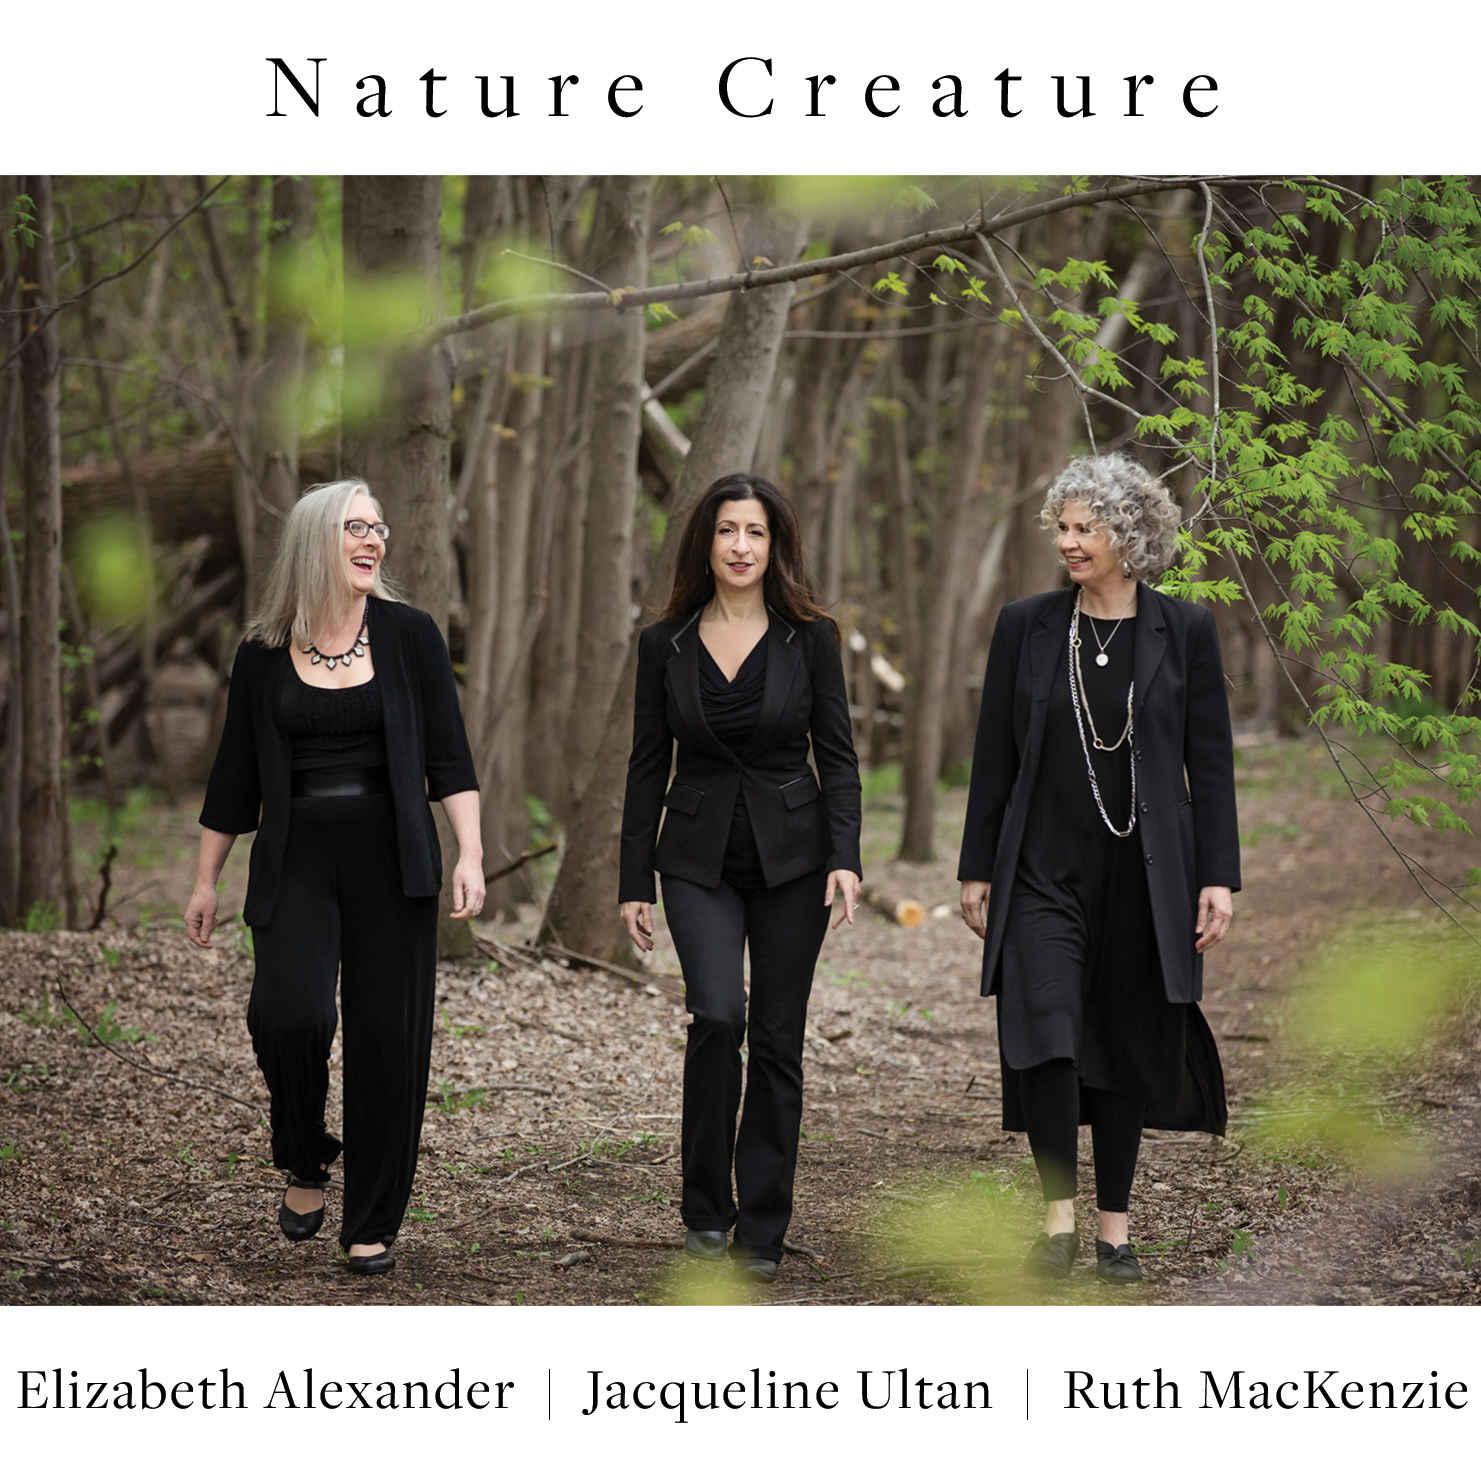 SEA-CD-03 - Nature Creature (CD/mp3)